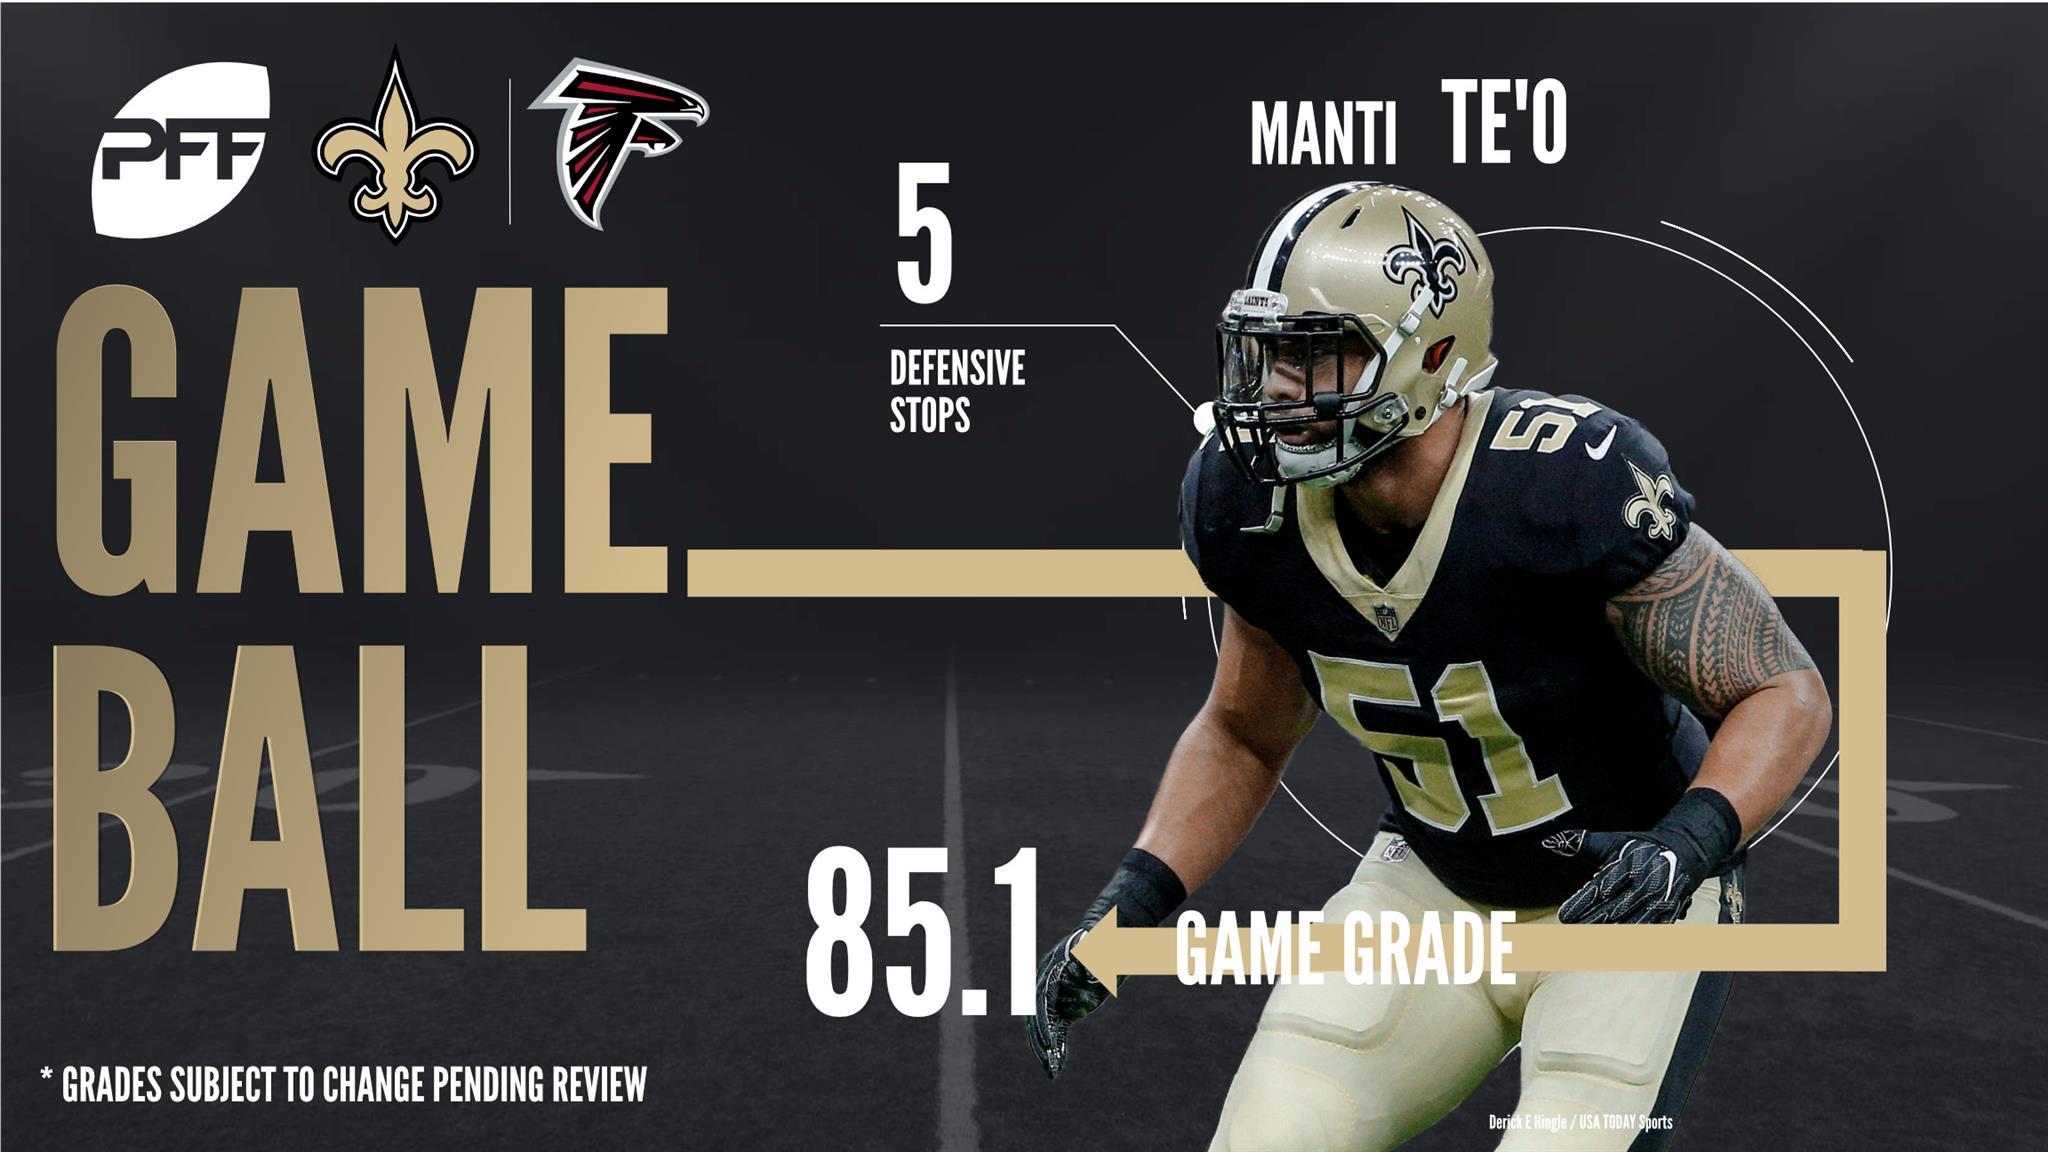 Manti Te'o, linebacker, New Orleans Saints